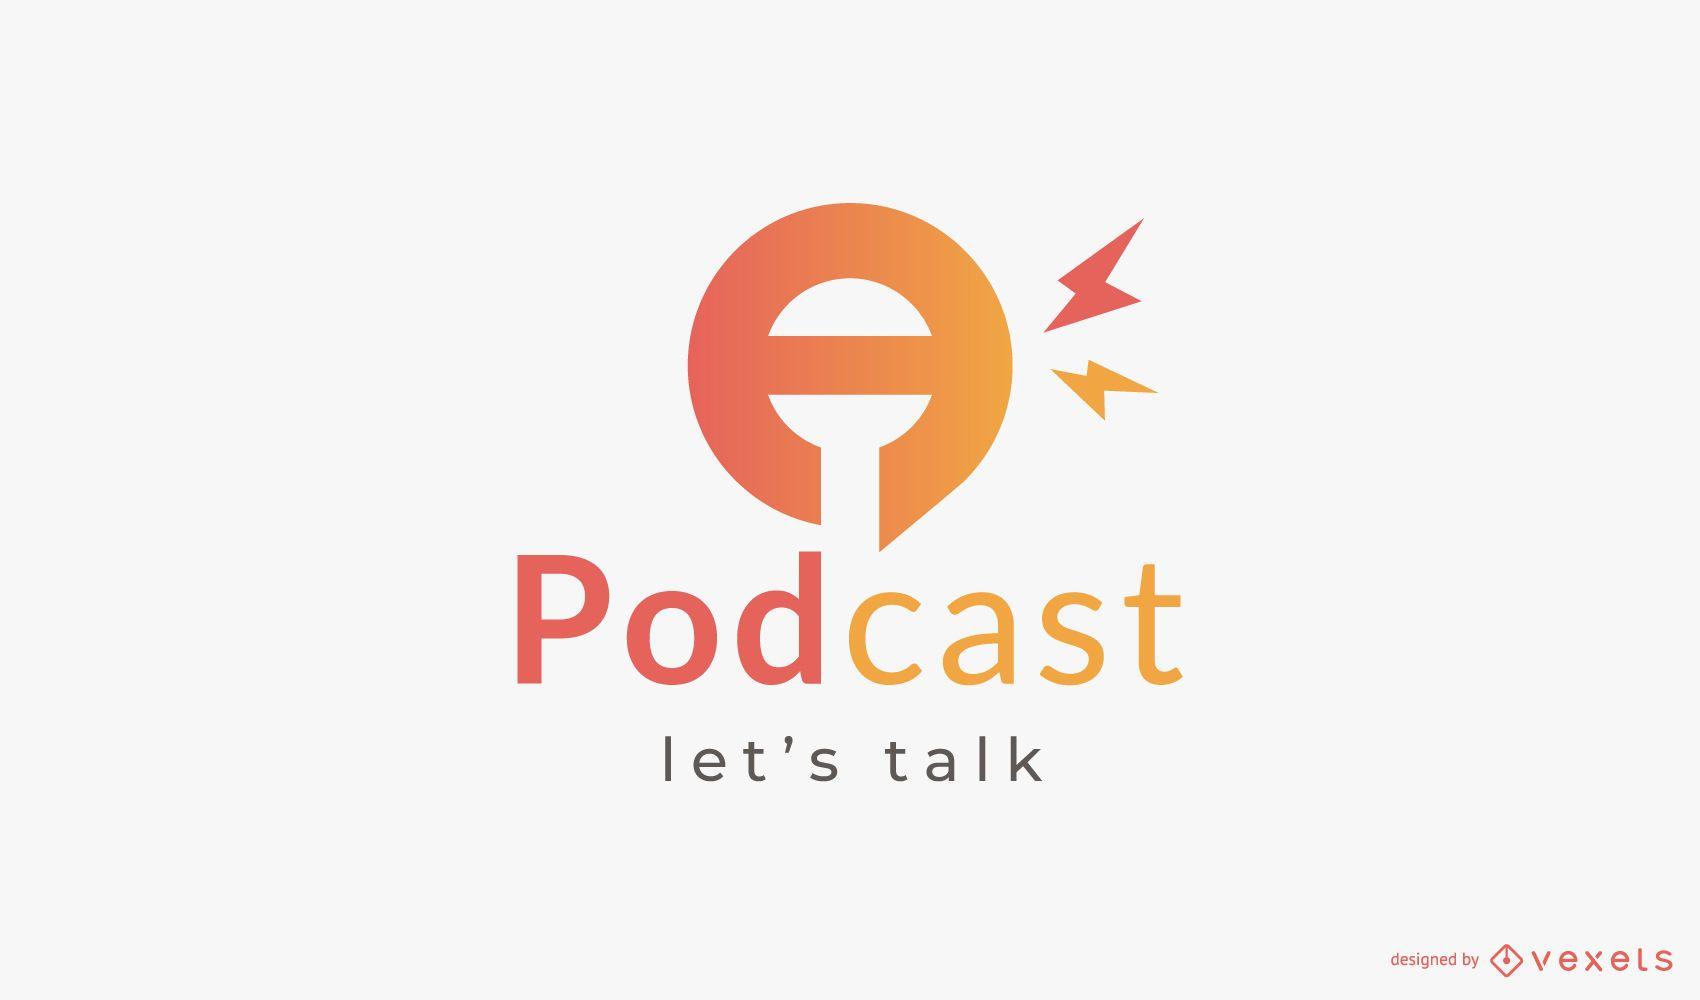 Diseño de logotipo de podcast de micrófono degradado